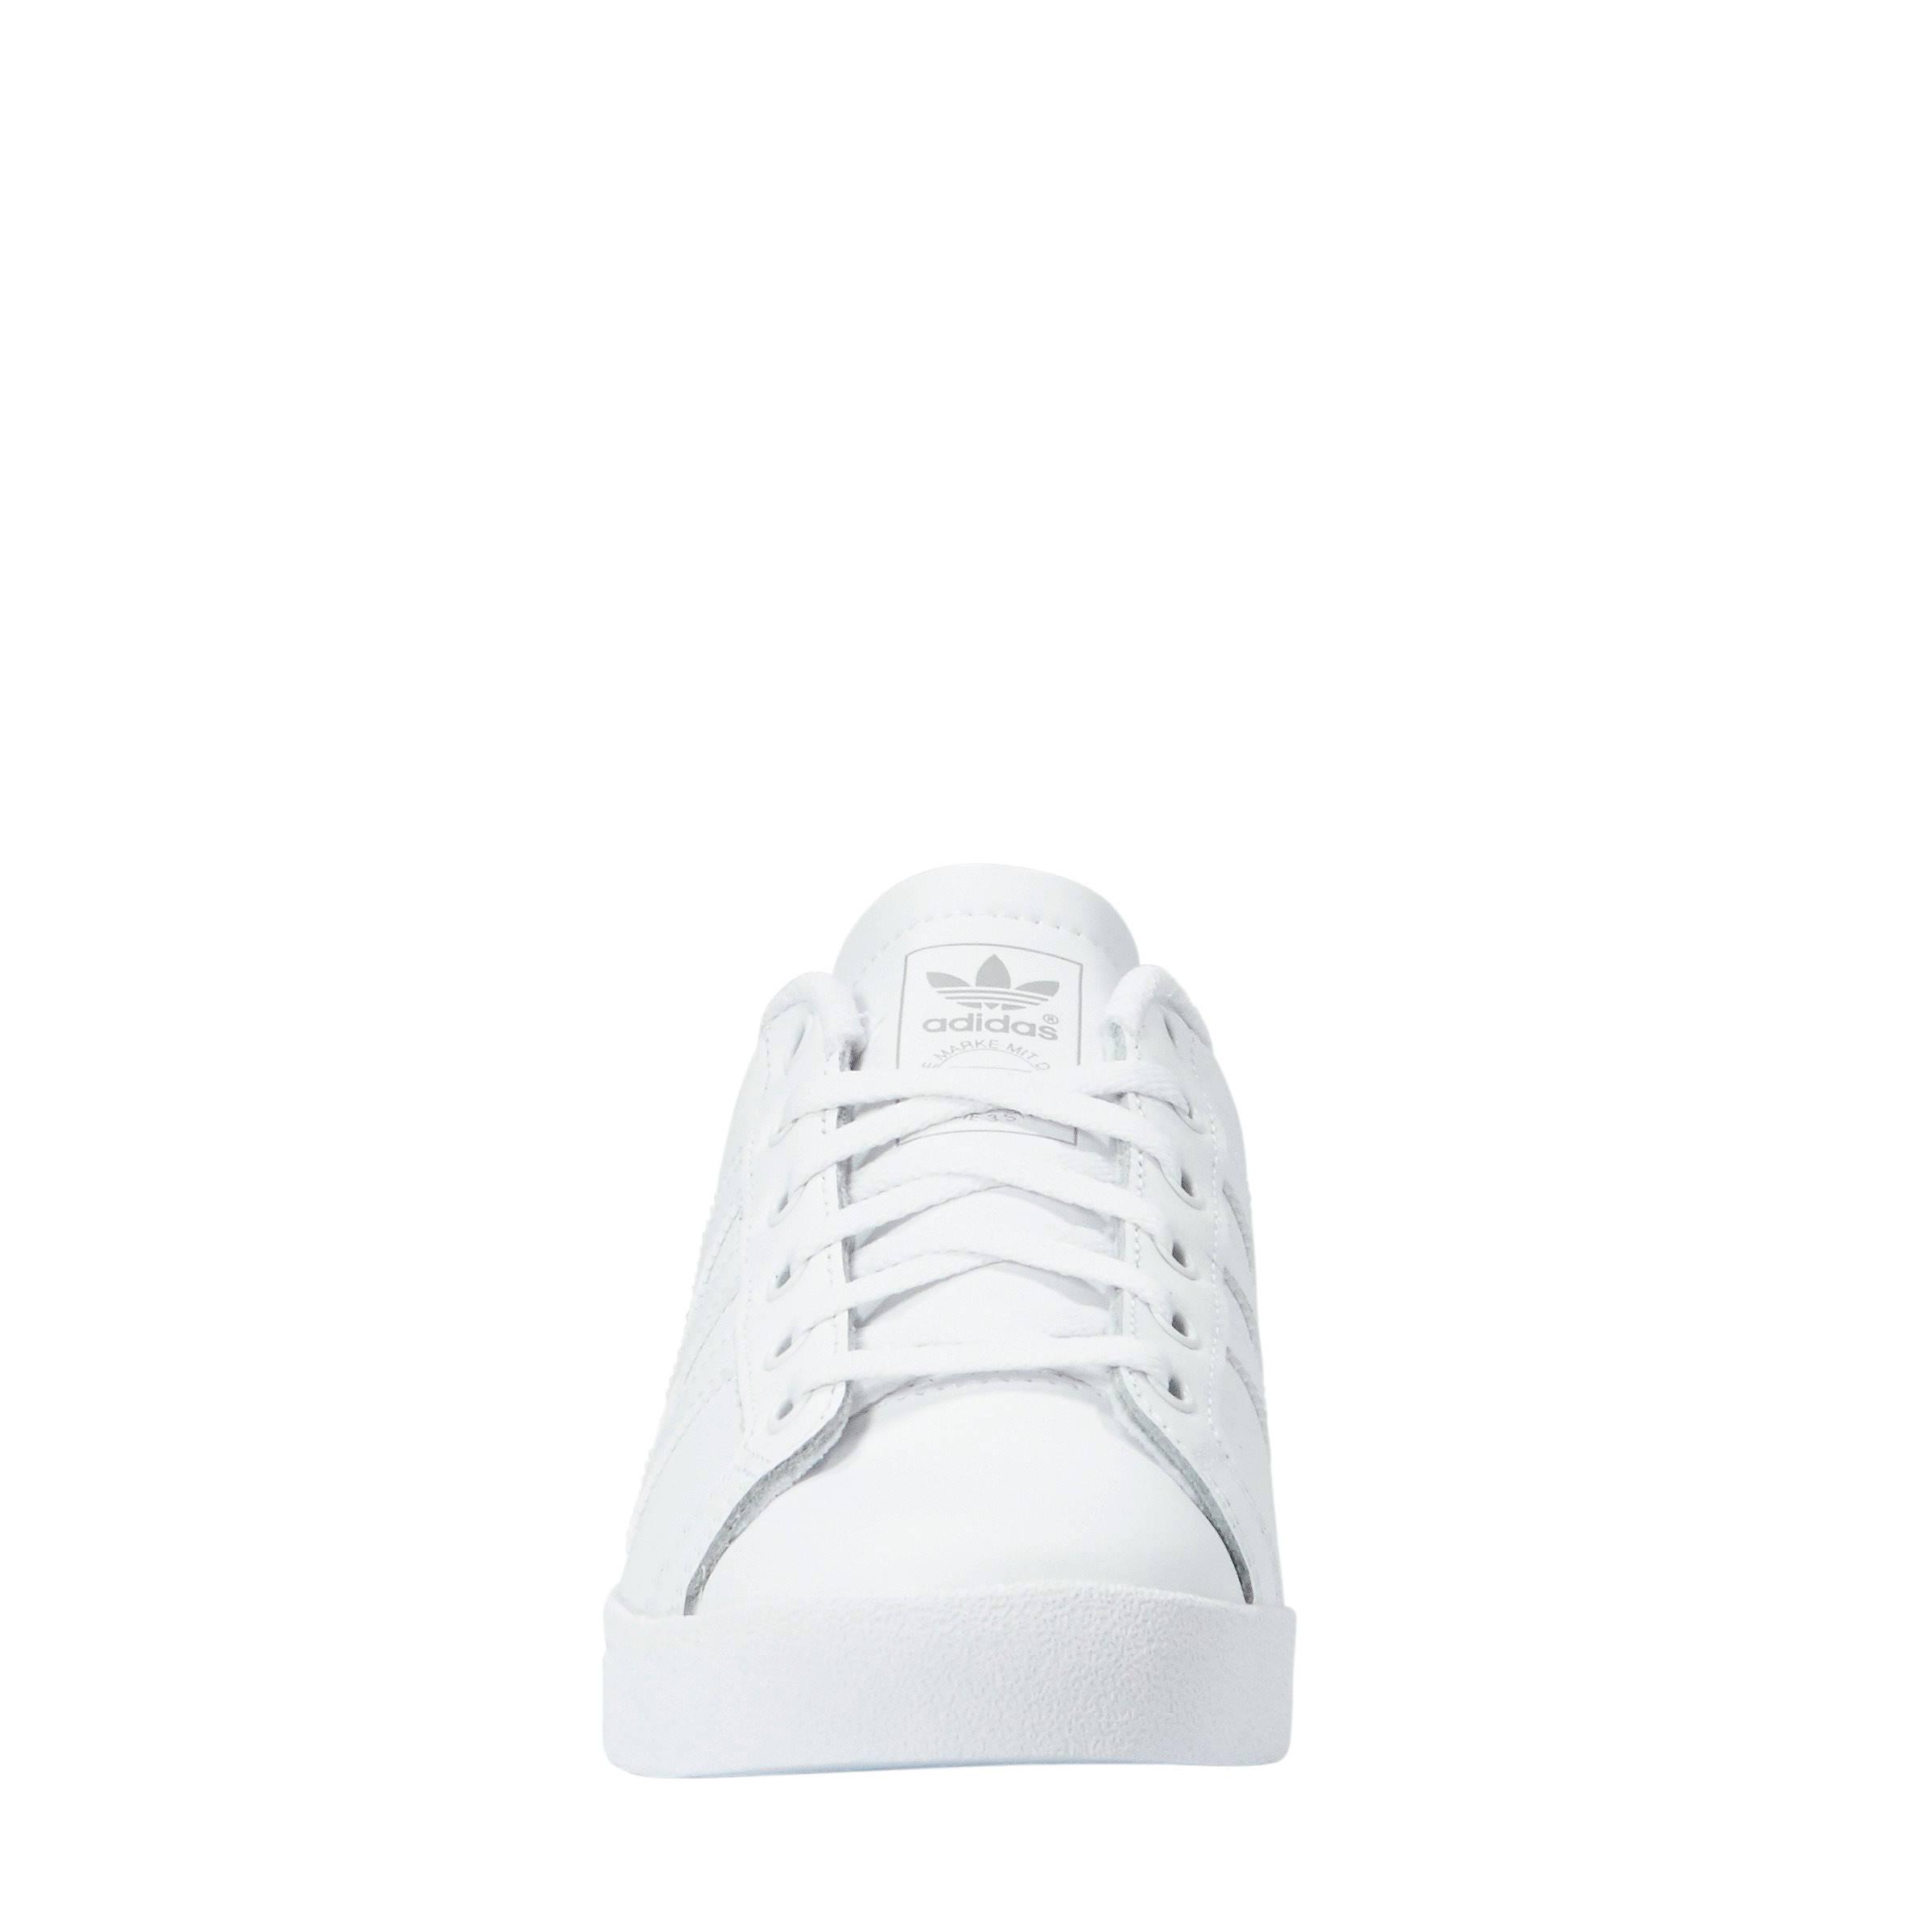 adidas Originals Coast Star J sneakers witroodblauw | wehkamp